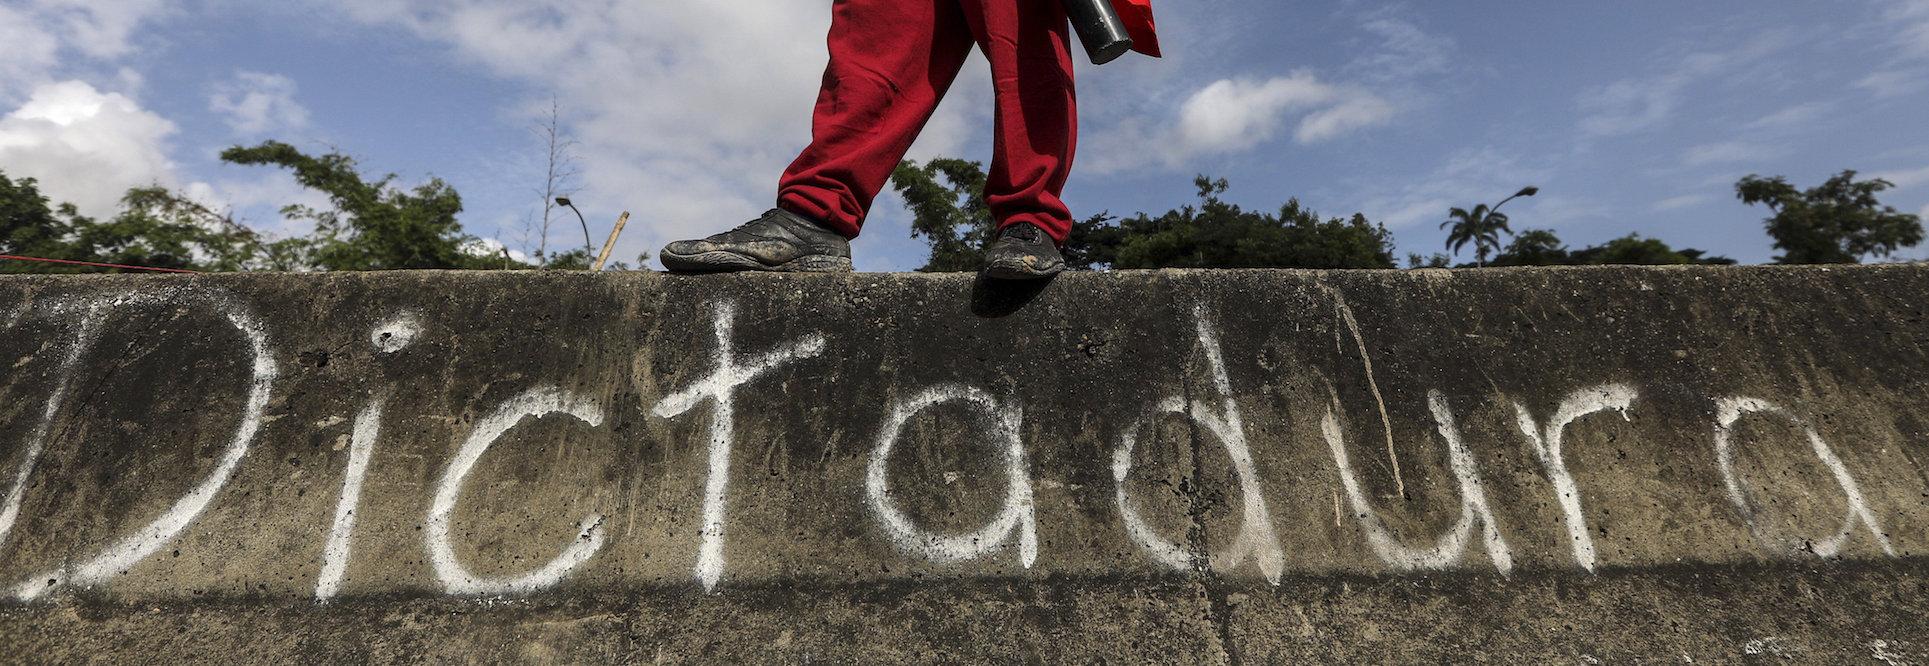 Running away from Venezuela